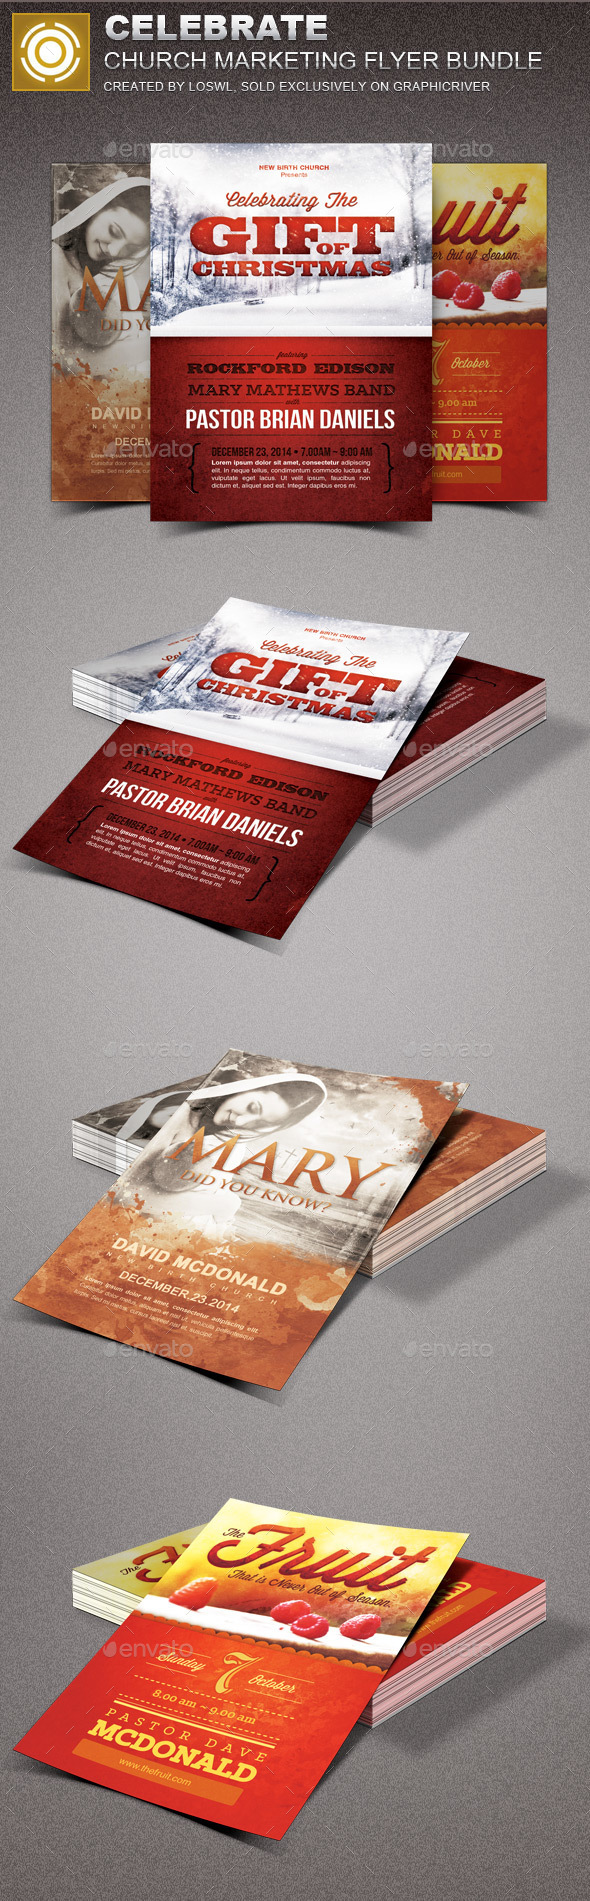 Celebrate Church Marketing Flyer Template Bundle - Church Flyers